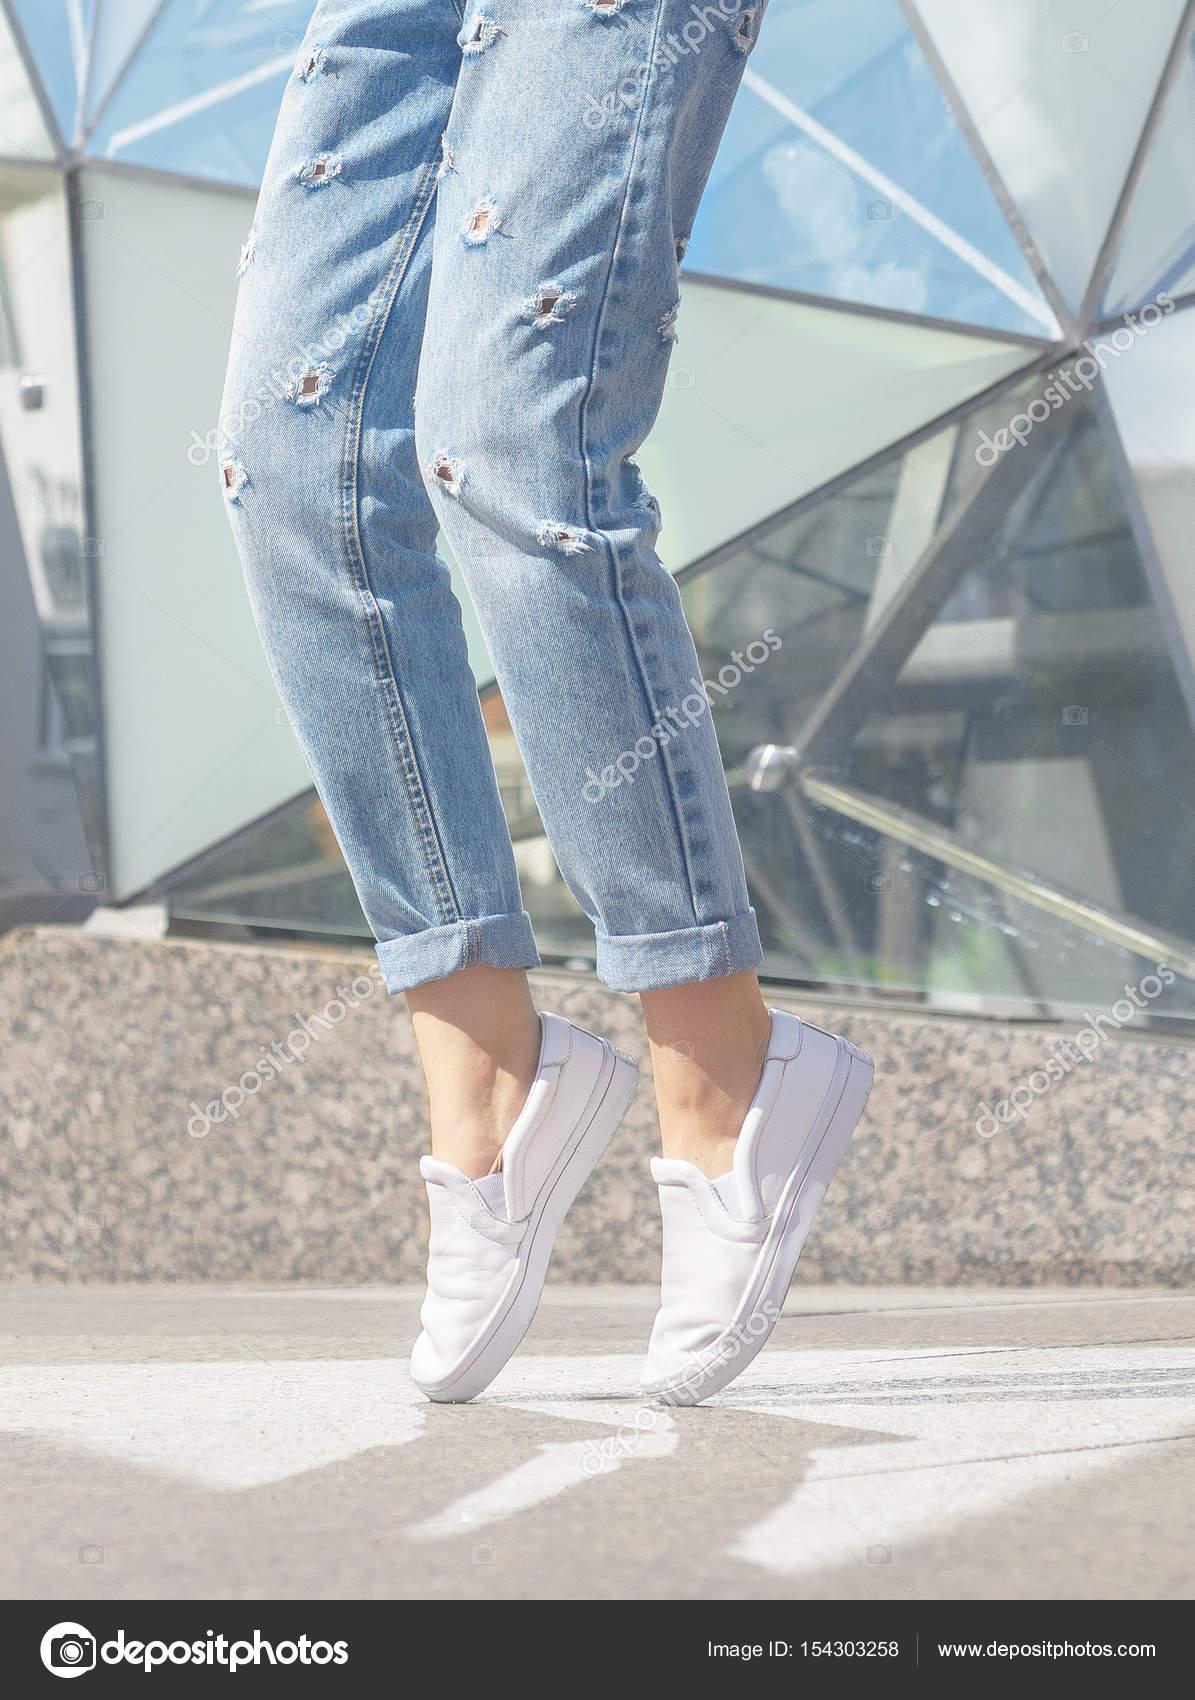 6de02db7c4d Γυναίκα που παρουσιάζουν. Καλοκαιρινό λουκ. Λευκά αθλητικά παπούτσια–  εικόνα αρχείου